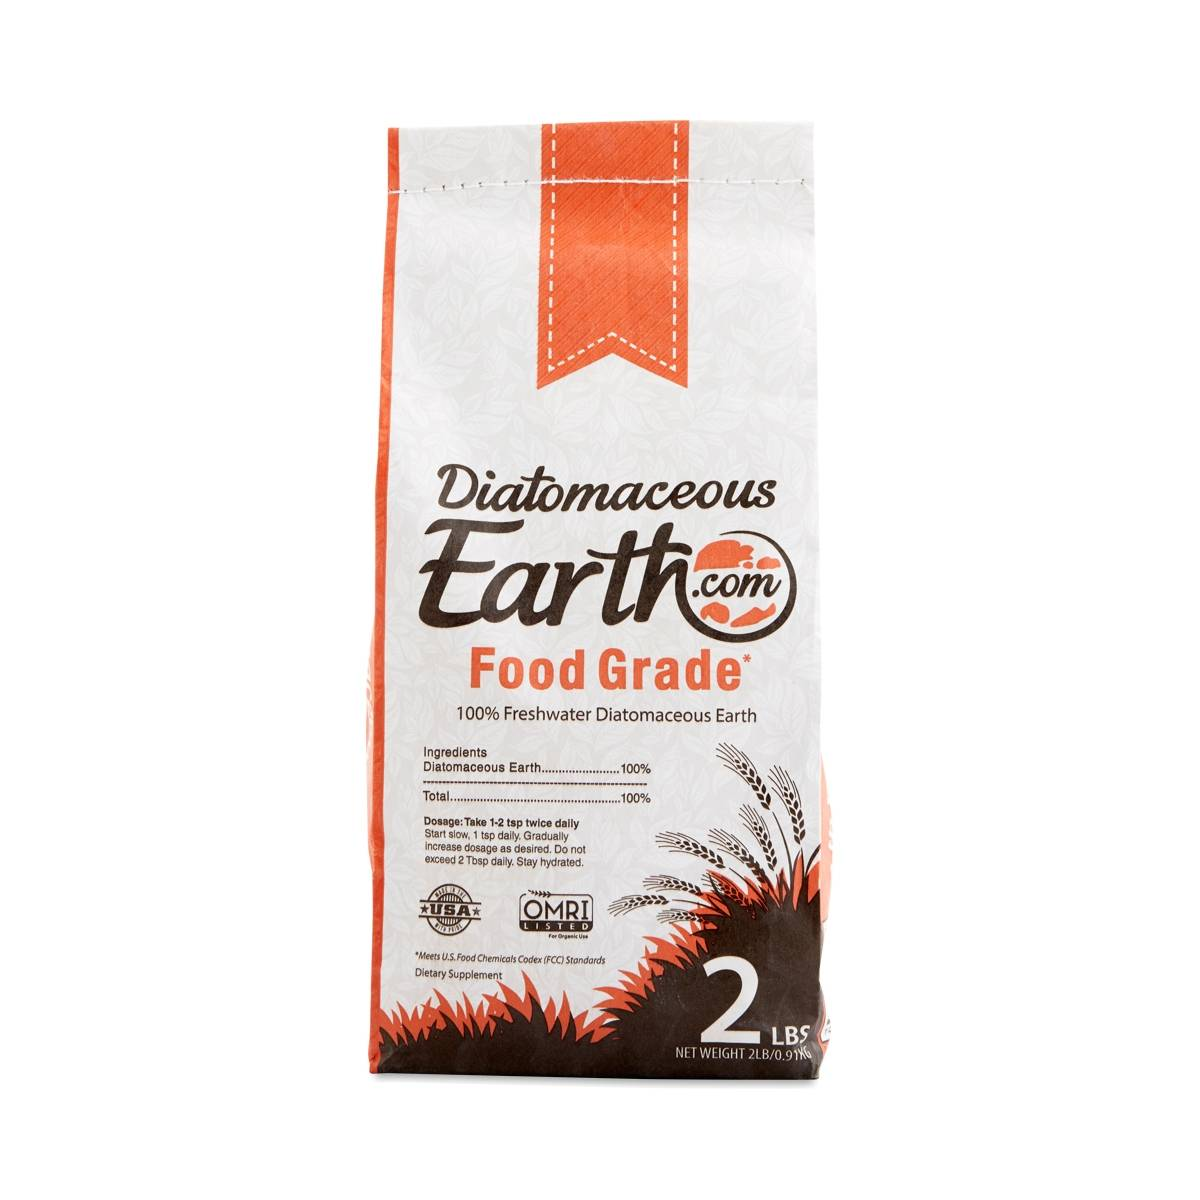 Food Grade Diatomaceous Earth - Thrive Market